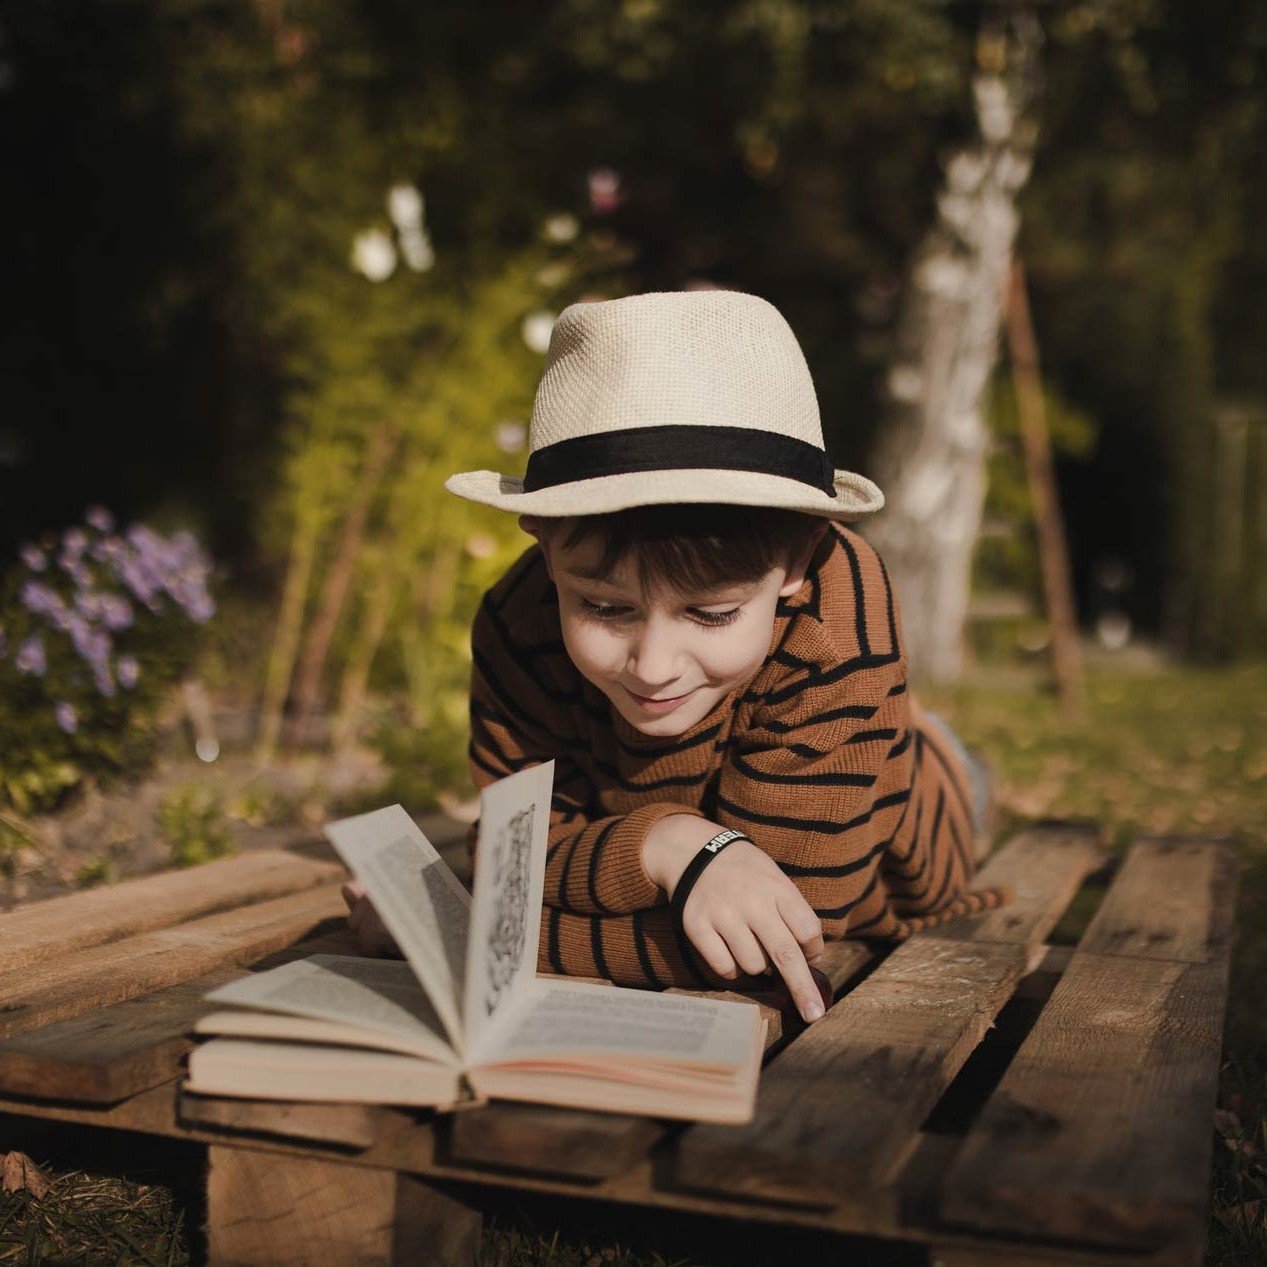 Aprendizaje y lenguaje en verano